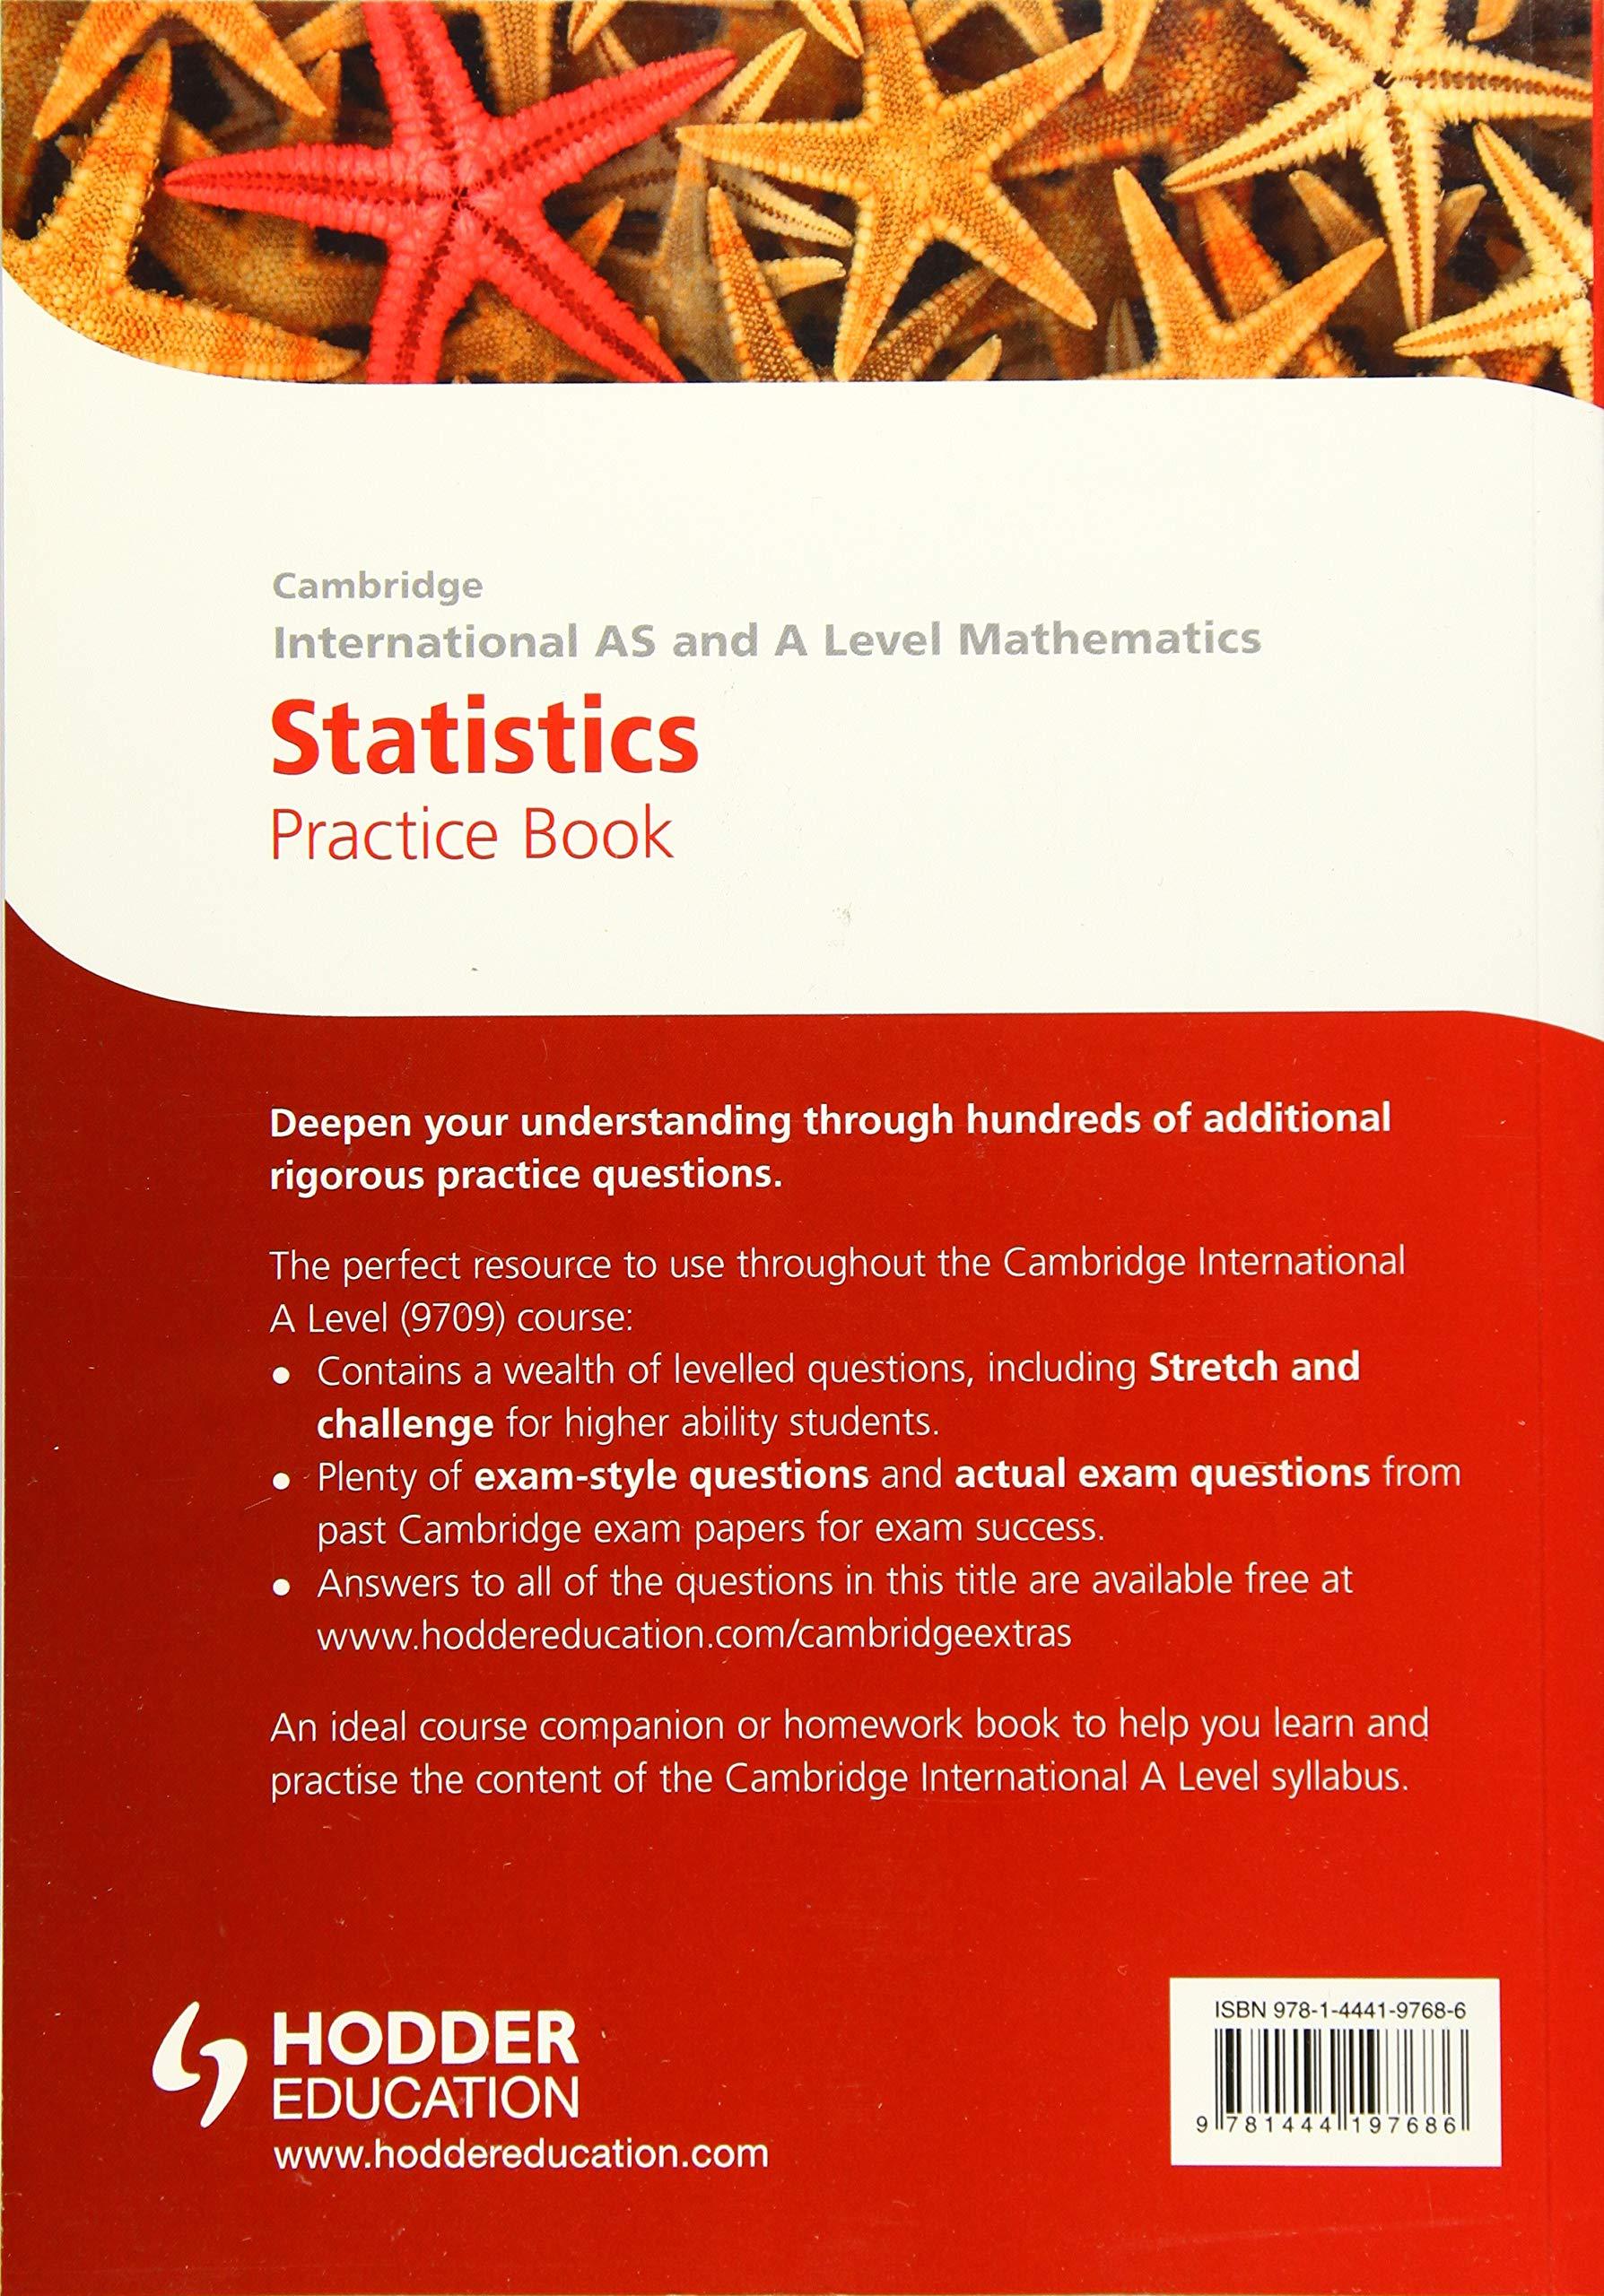 Buy Cambridge International A/AS Mathematics, Statistics